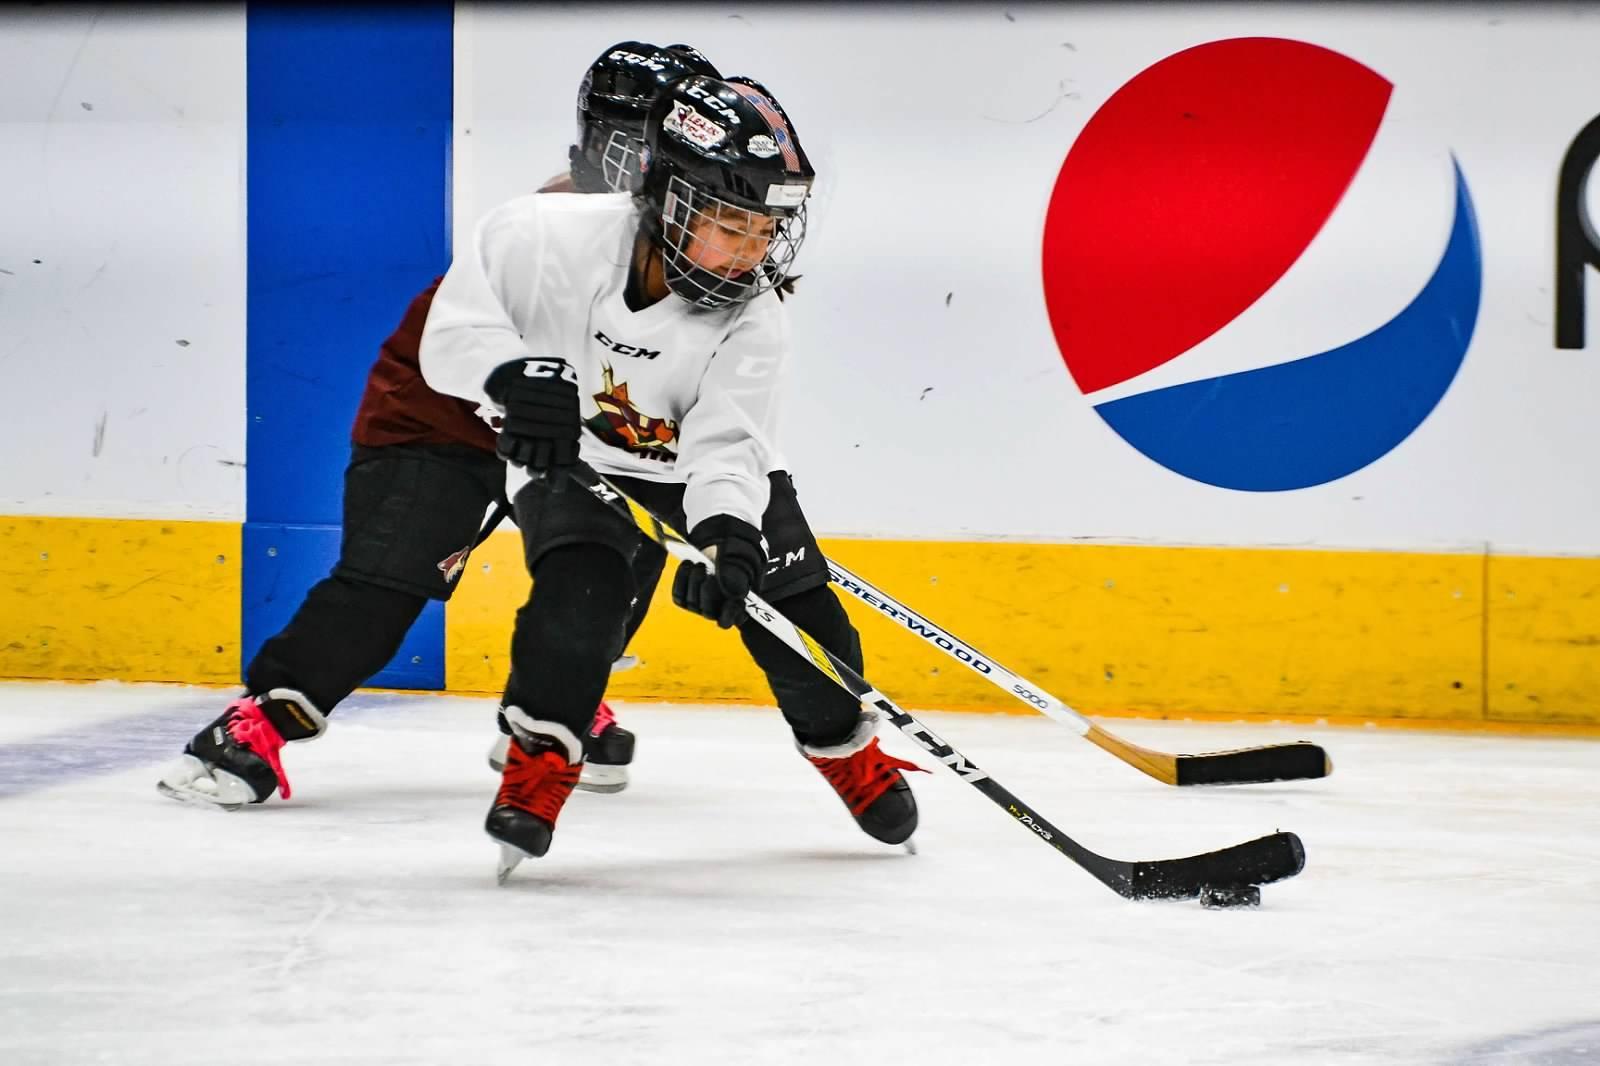 Arizona Kachinas Hockey